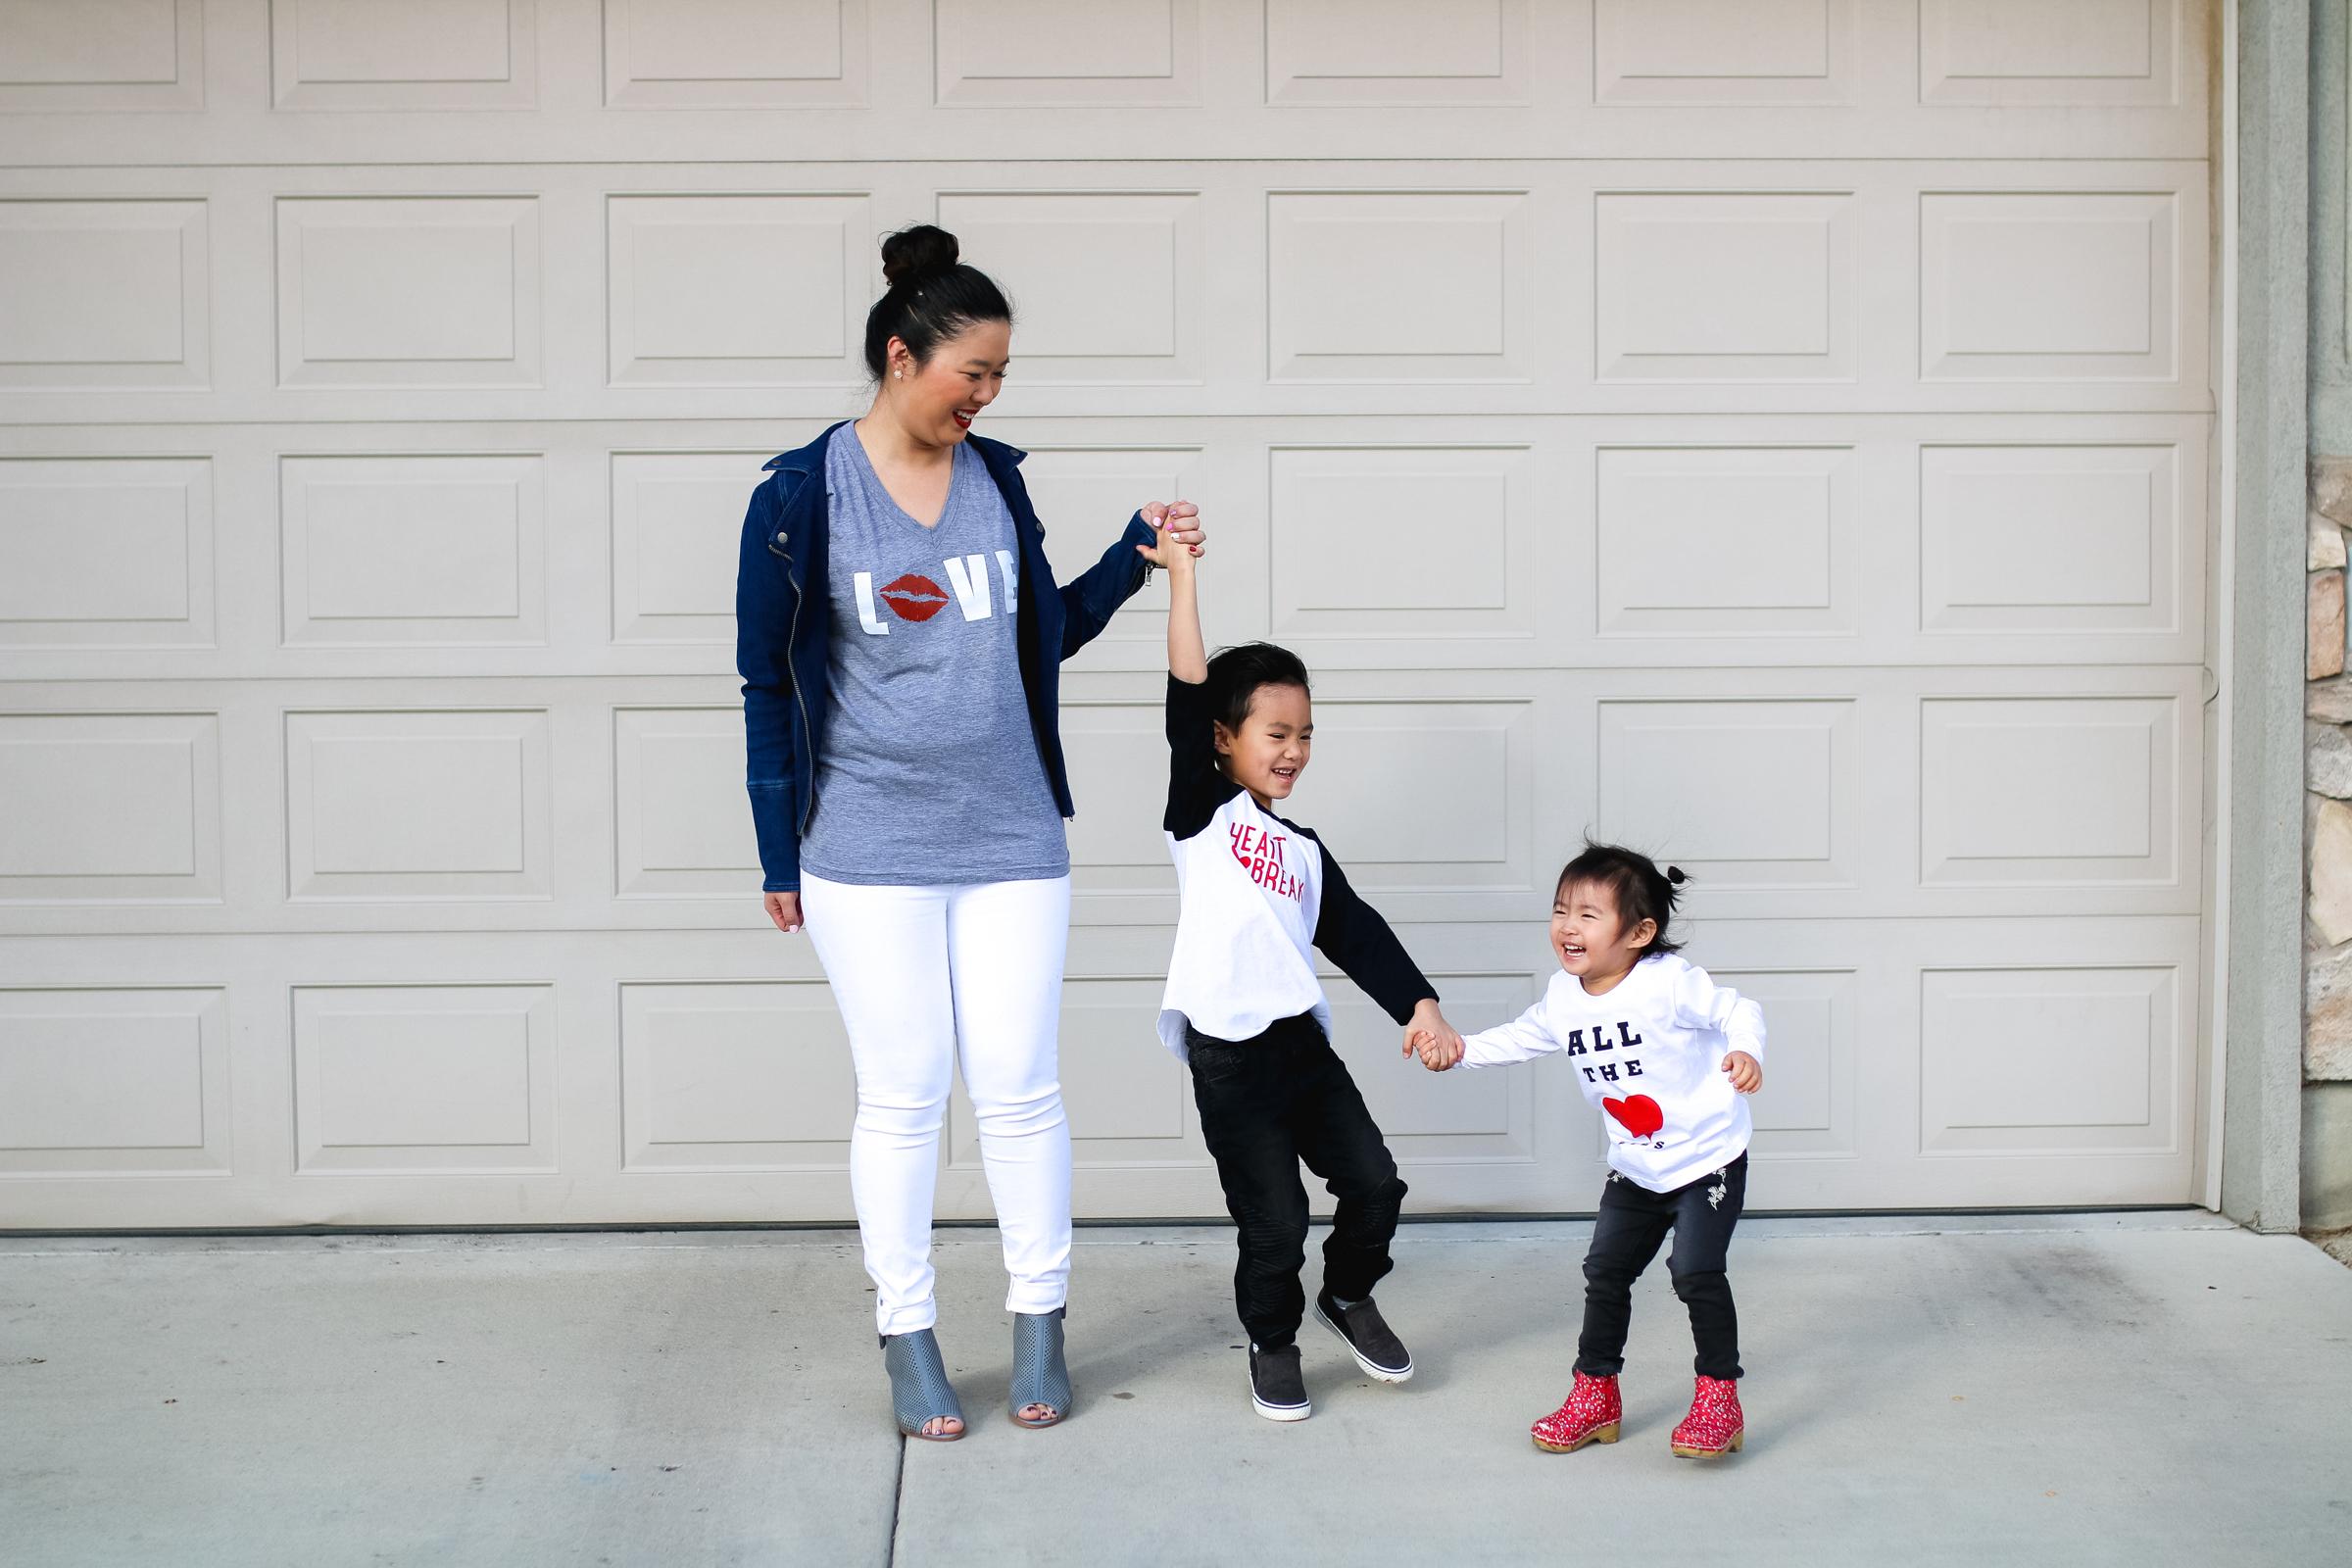 Family Valentine's Day shirts